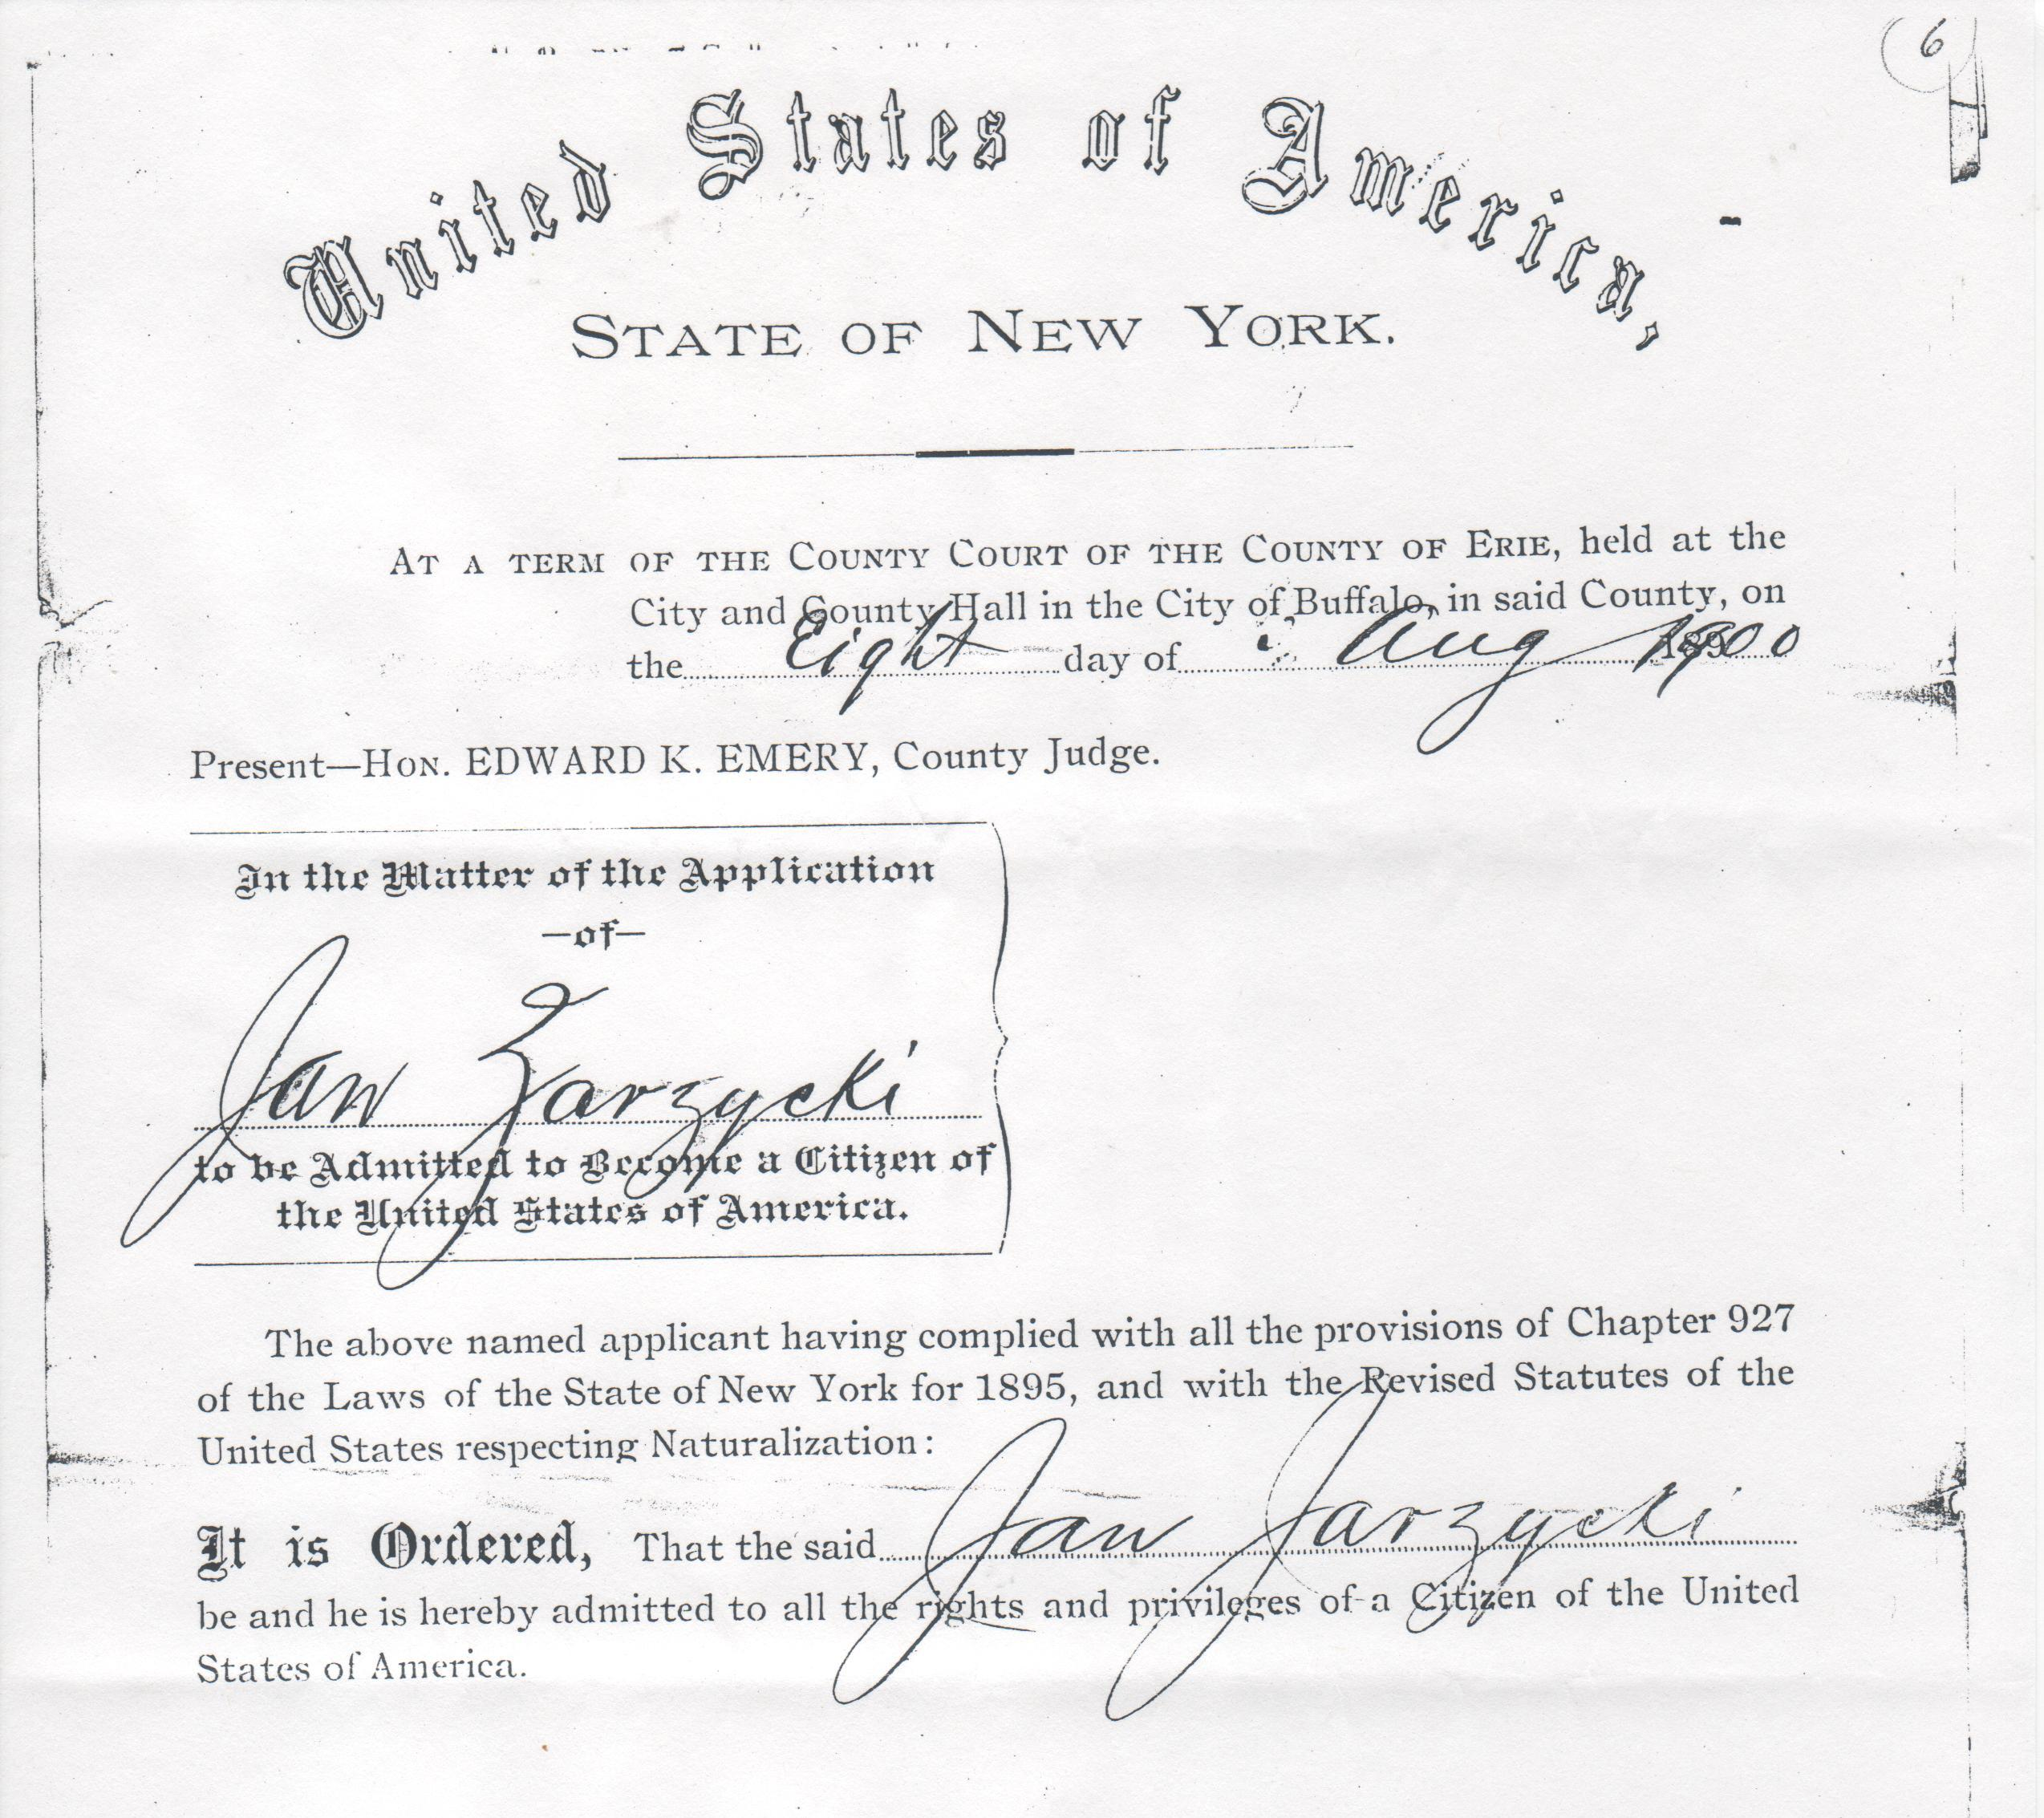 Jan Zazycki naturalization certificate 2